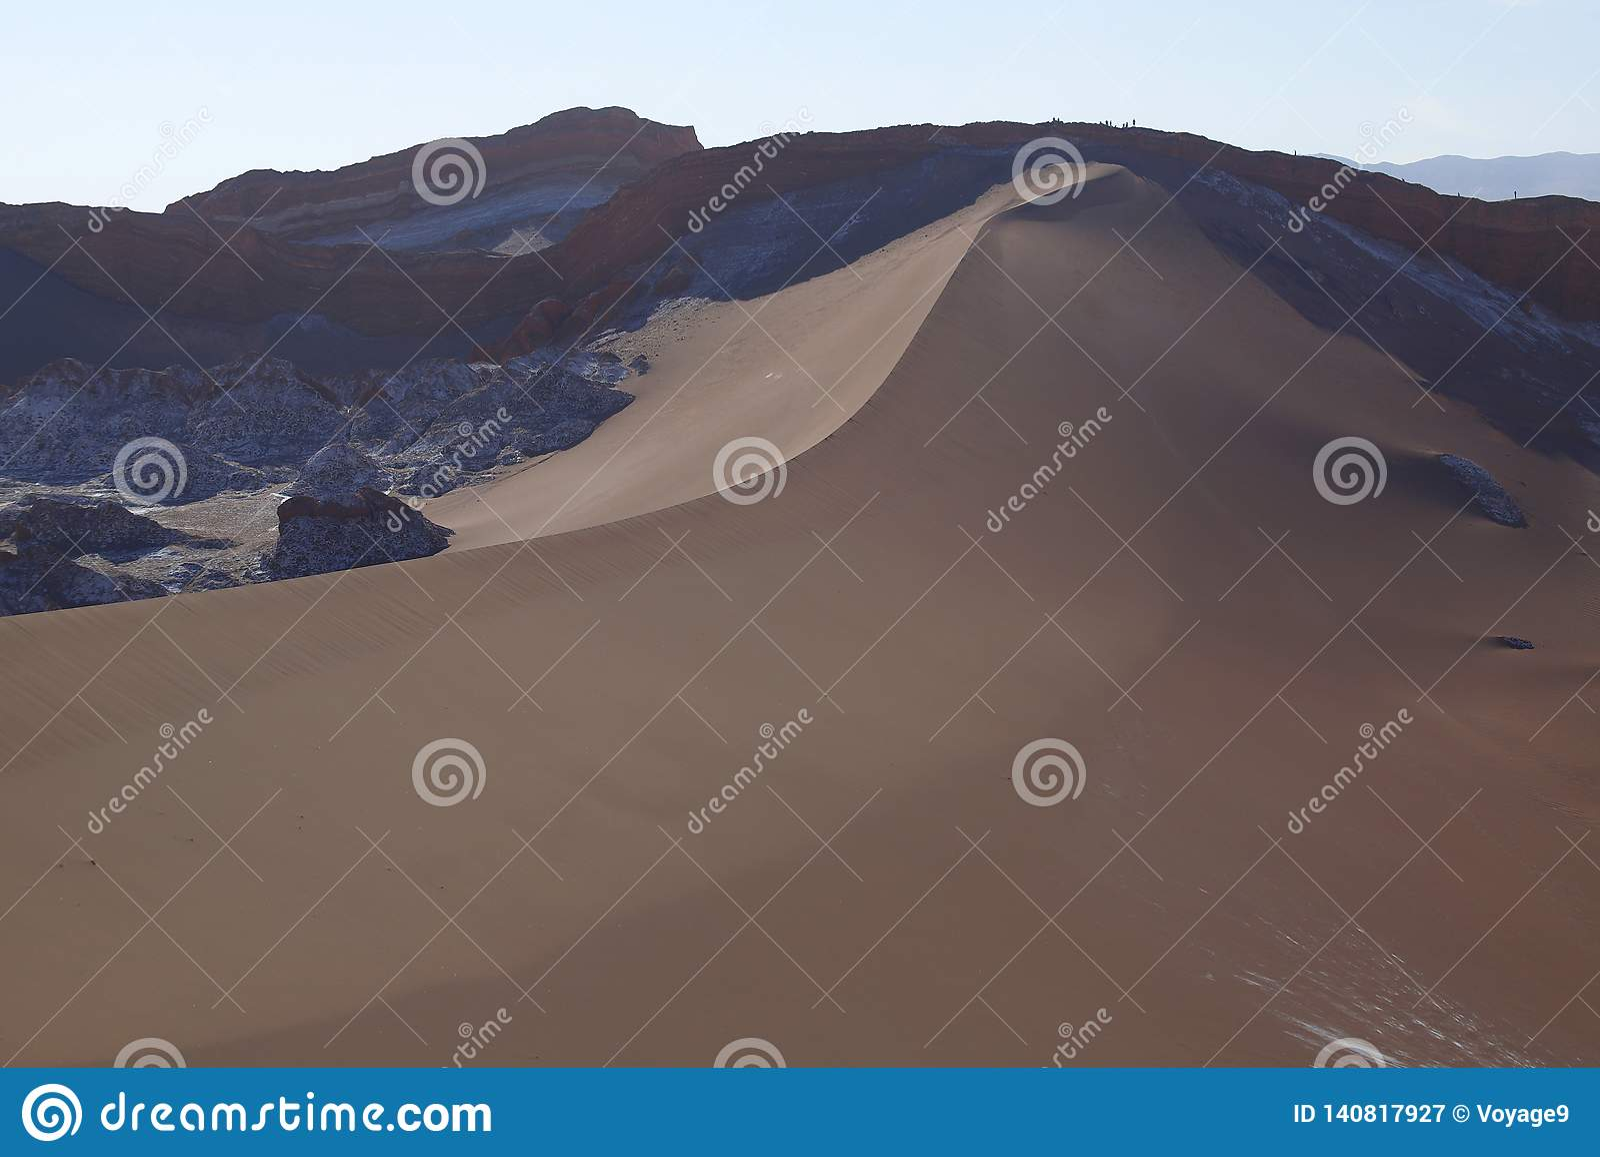 Valle de la Luna - Valley of the Moon and snow-covered volcanoes, Atacama Desert, Chile